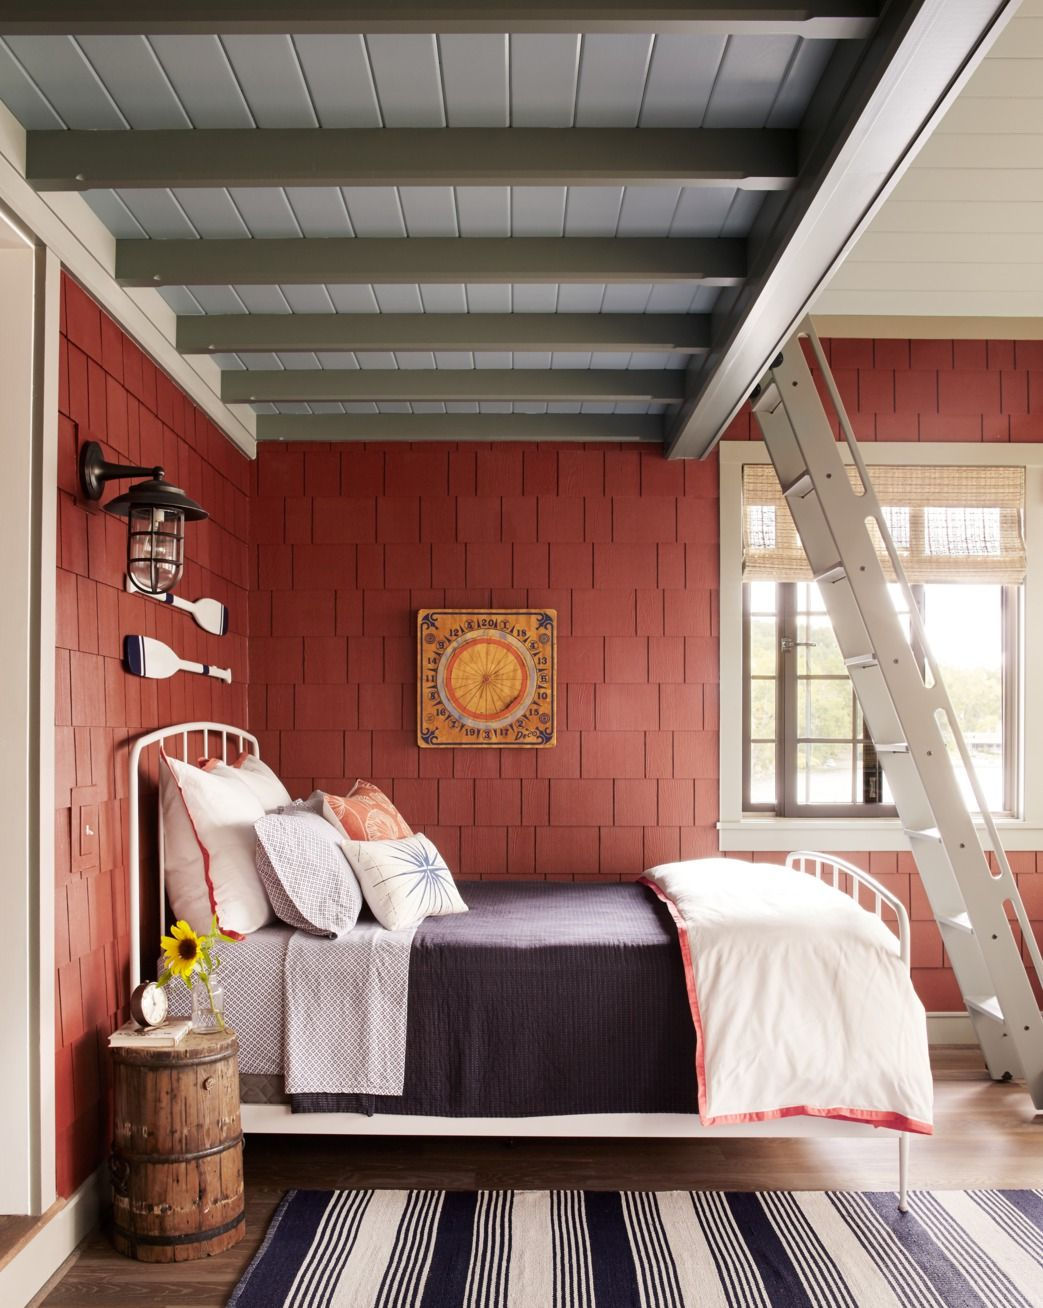 27 Rustic Bedroom Ideas - Rustic Decorating Ideas